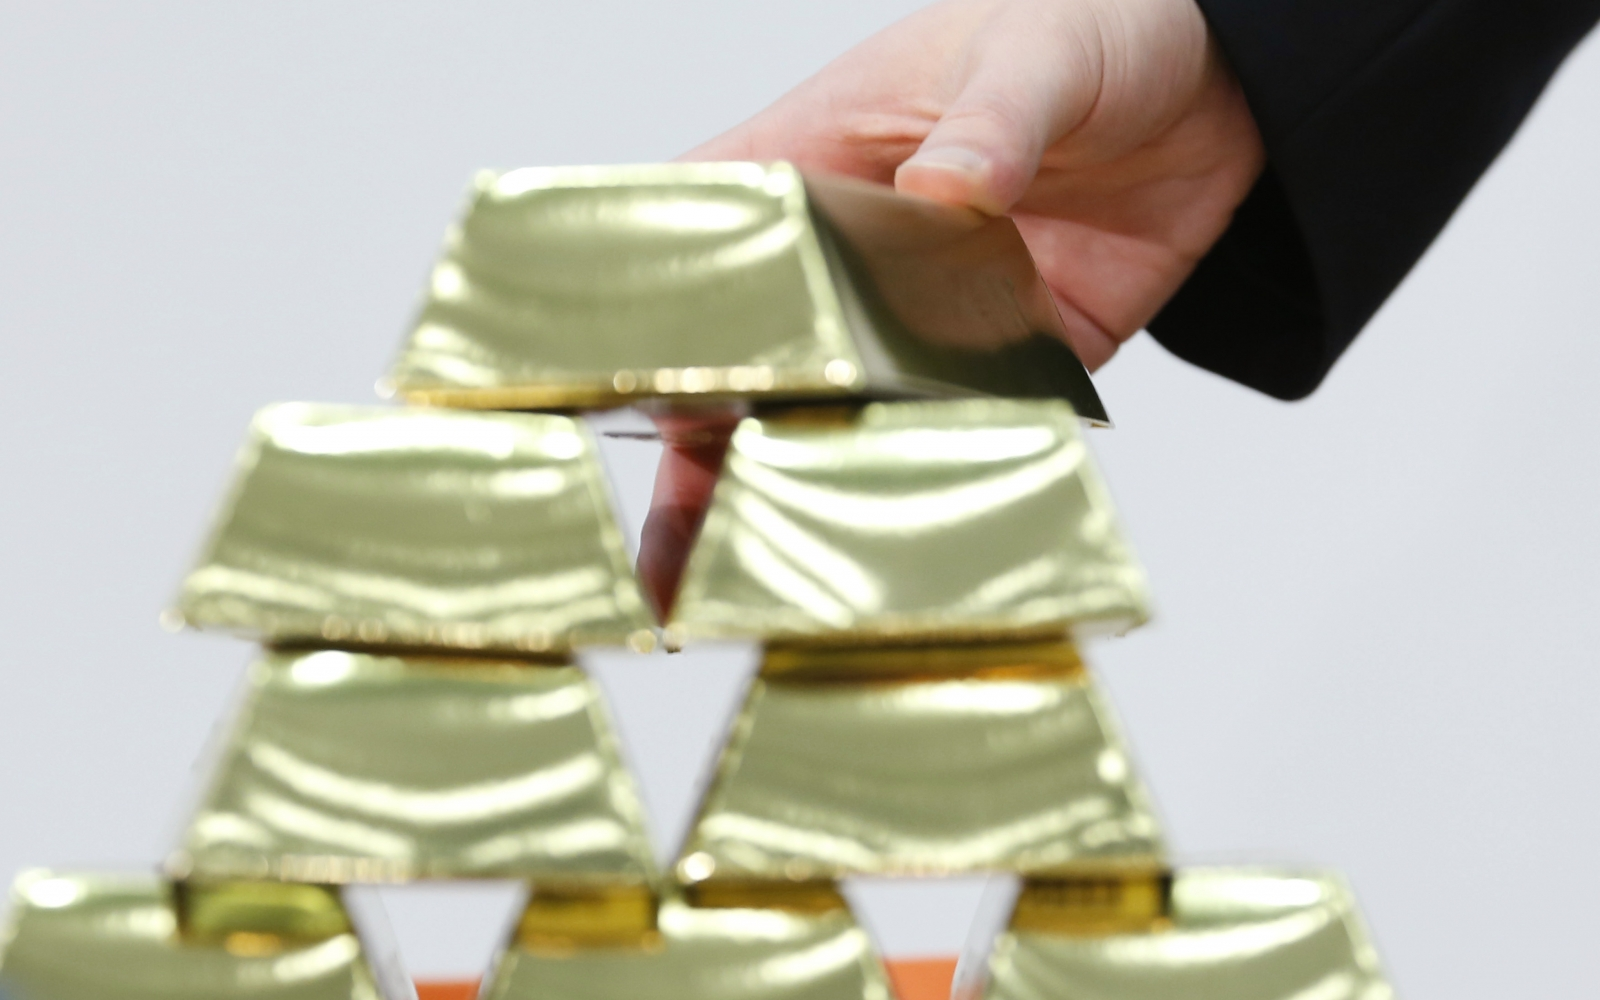 North Korean diplomat caught smuggling gold